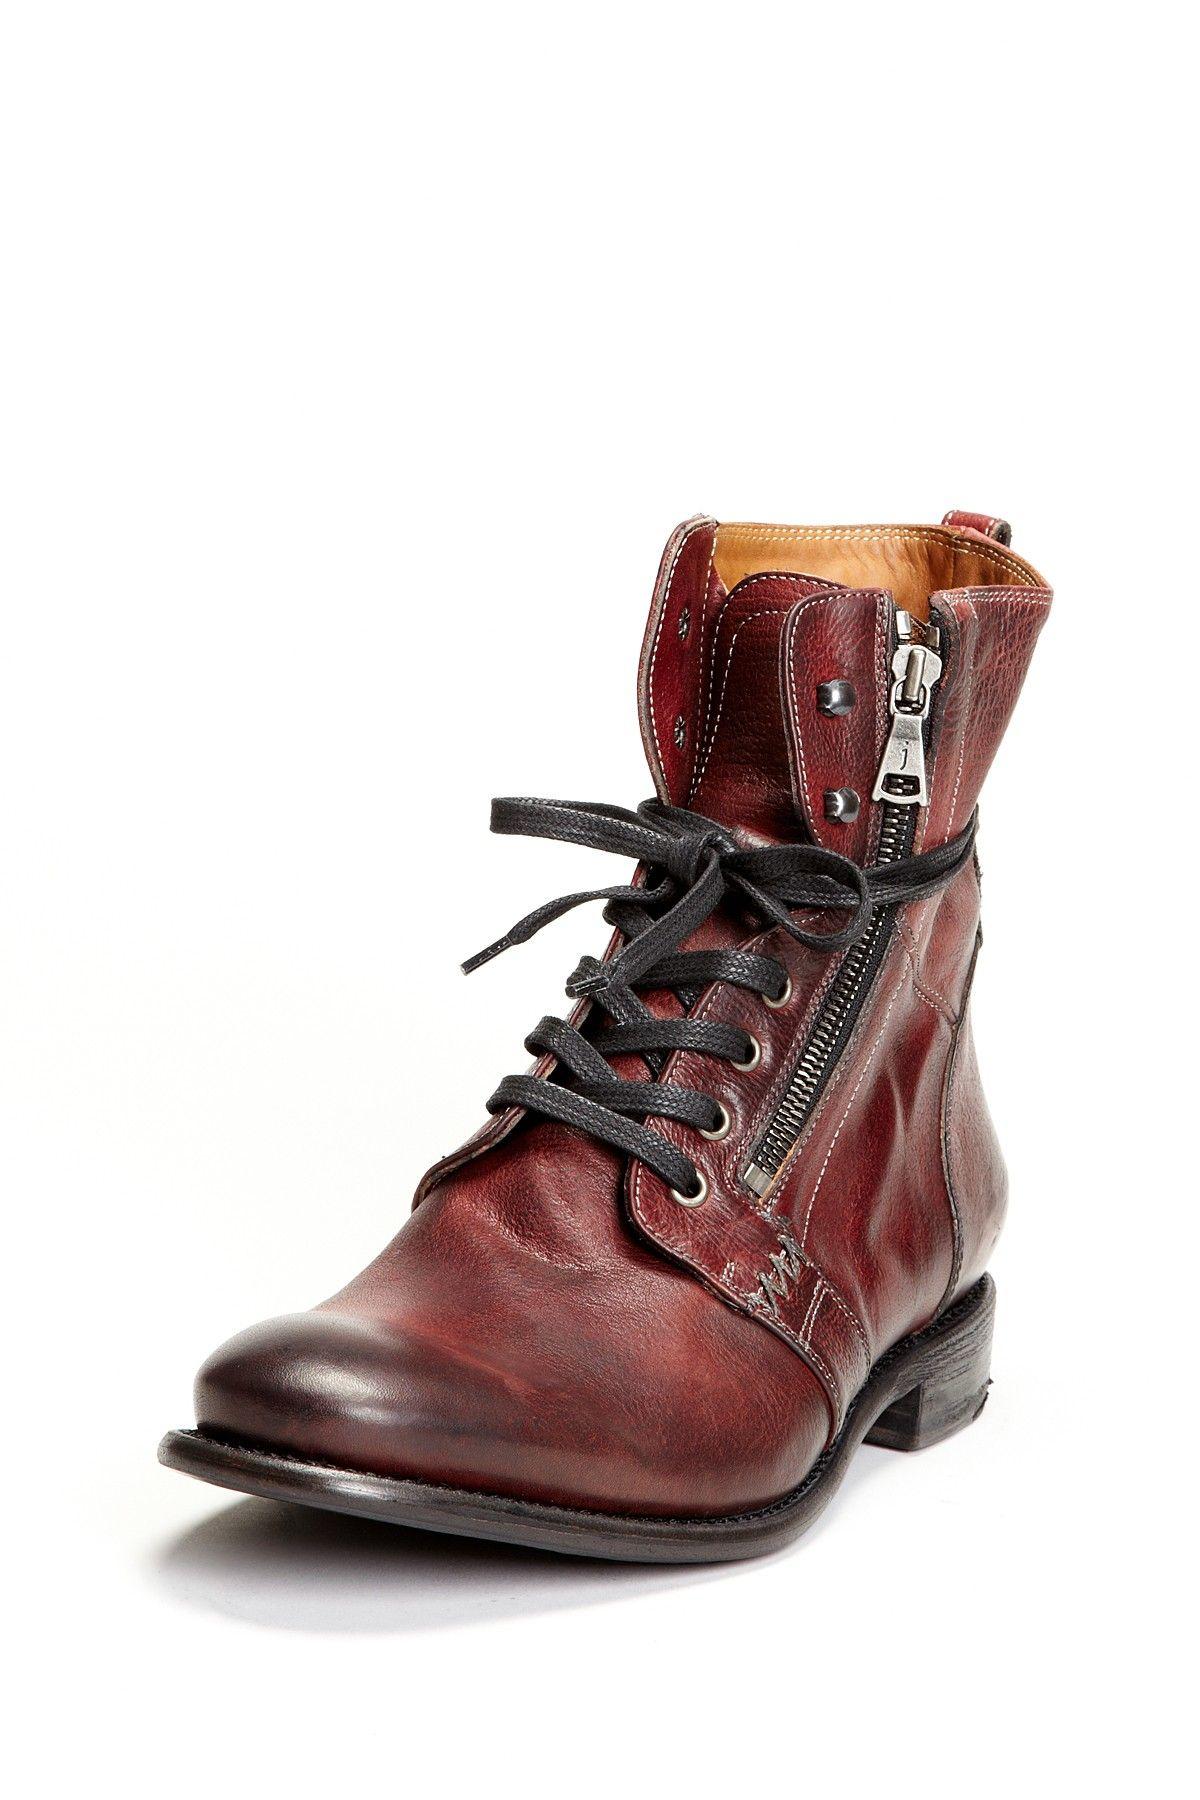 HOT man boots!! John Varvatos Lace-Up Side Zip Boot #hubby